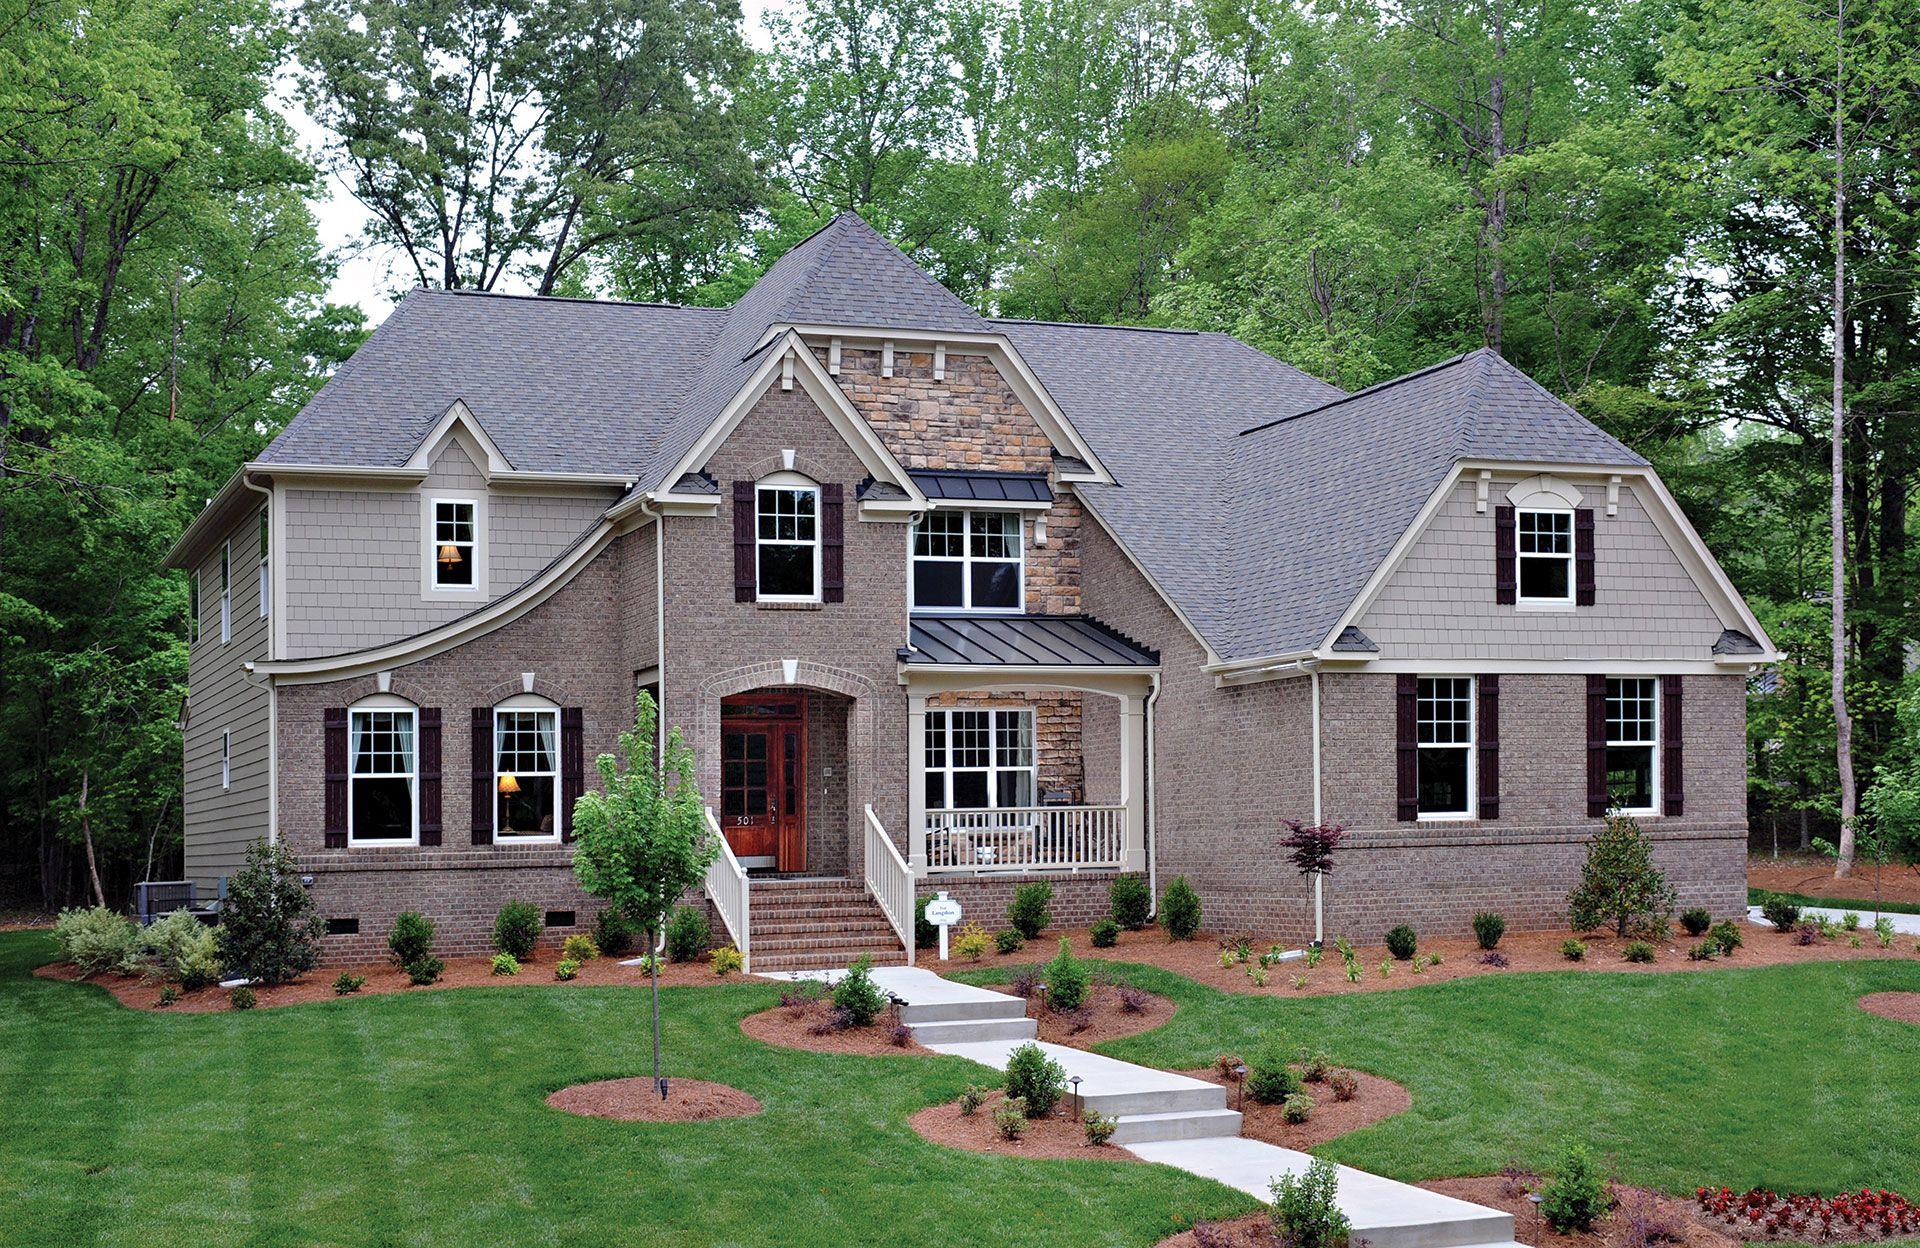 Single Family for Sale at Ash Lawn 639 Running Cedar Lane Durham, North Carolina 27705 United States